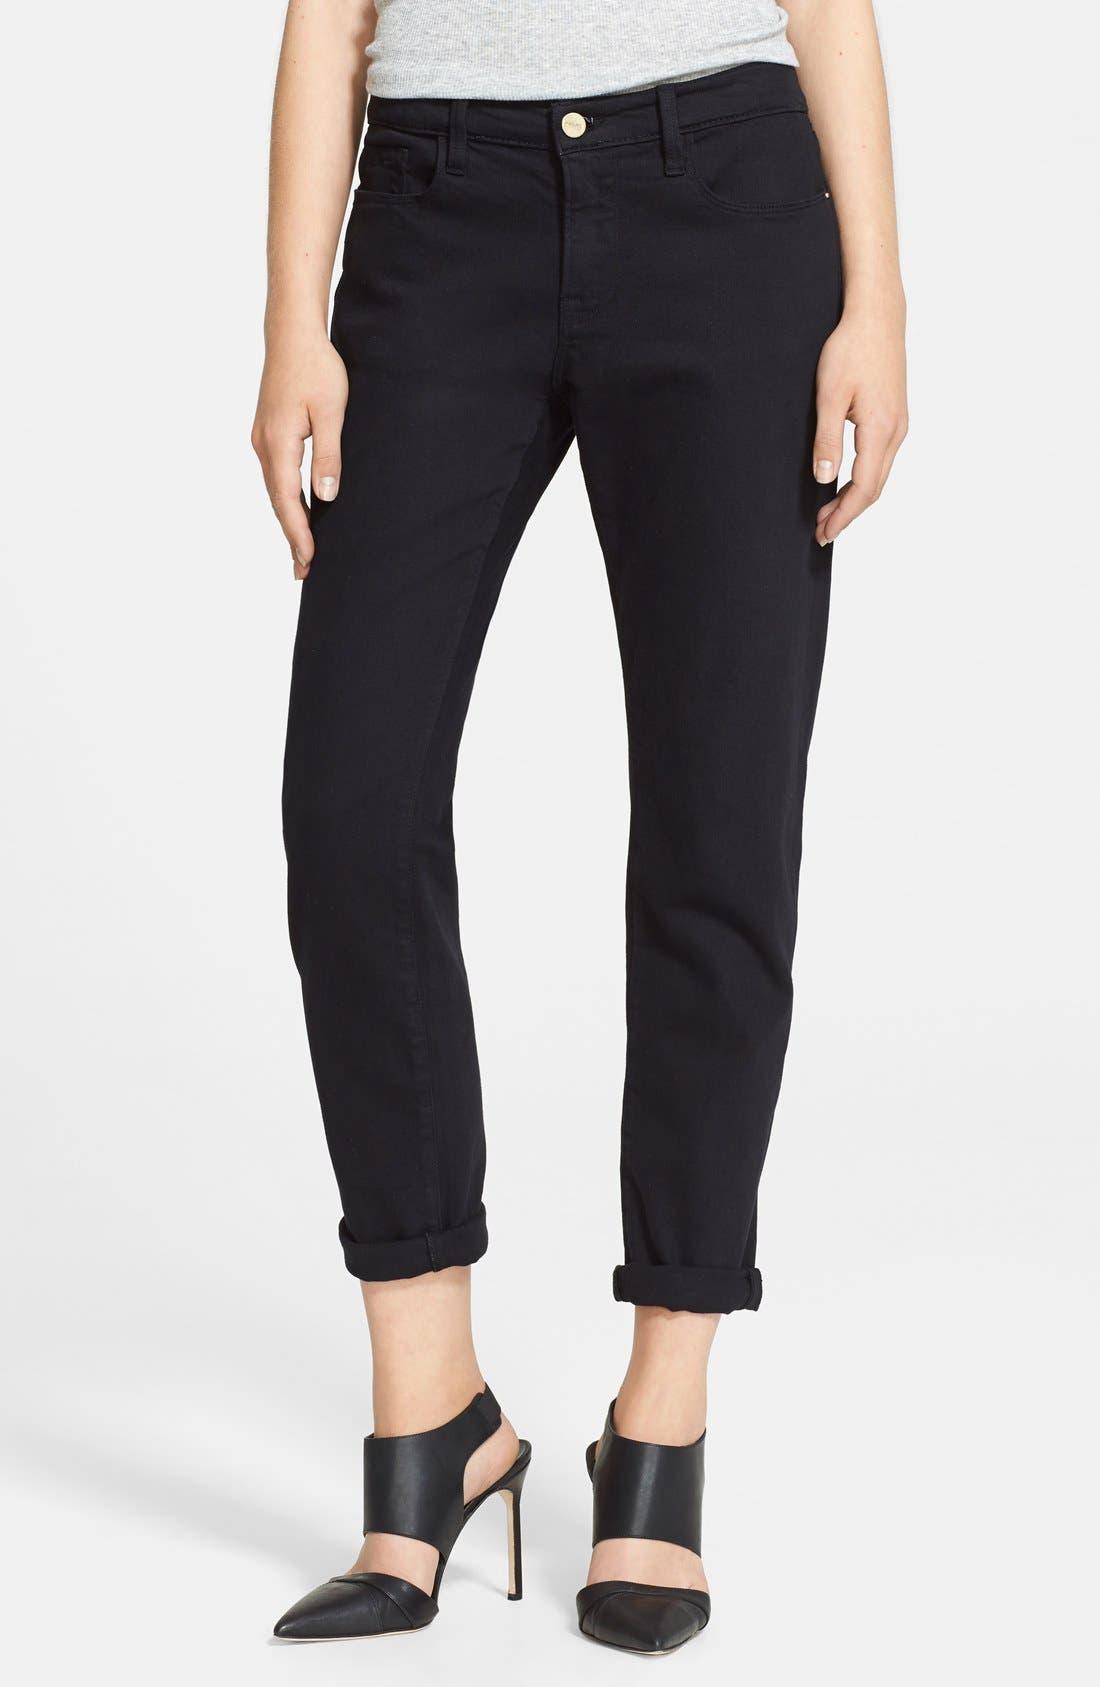 Women's Frame Denim 'Le Garcon' Boyfriend Jeans,  29 - Black